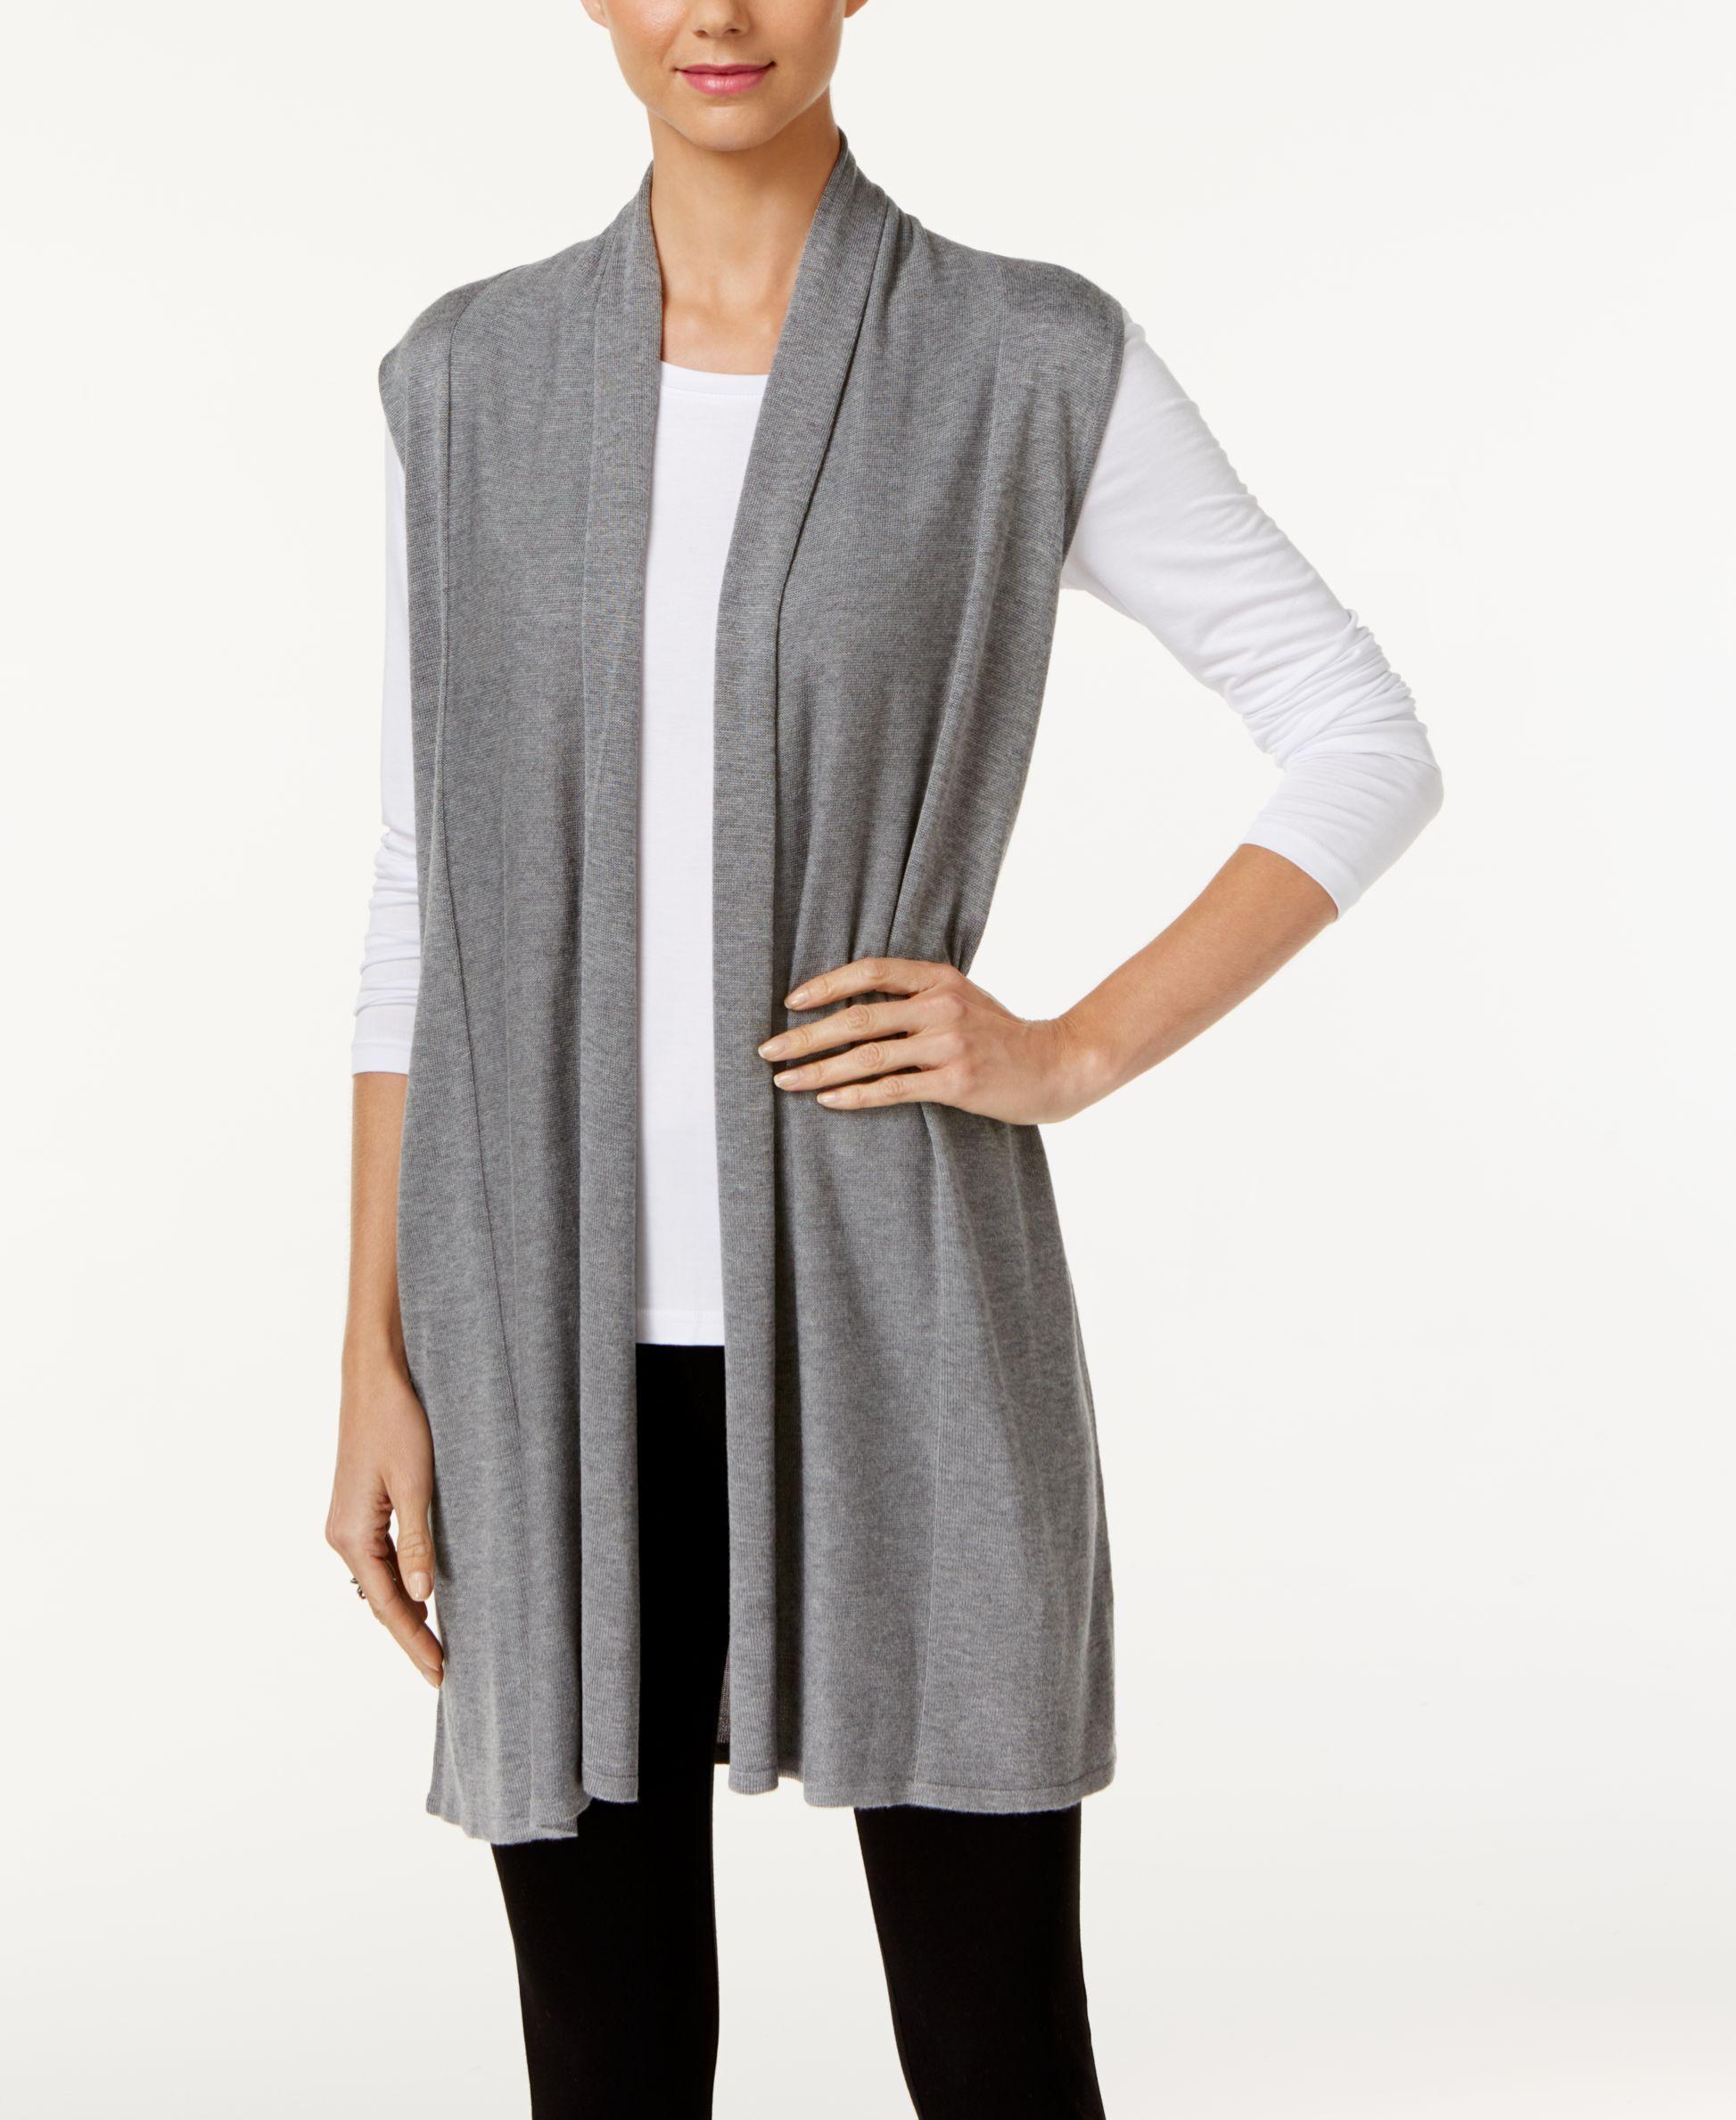 Joseph A Shawl-Collar Duster Sweater Vest | Cardigans For Men ...